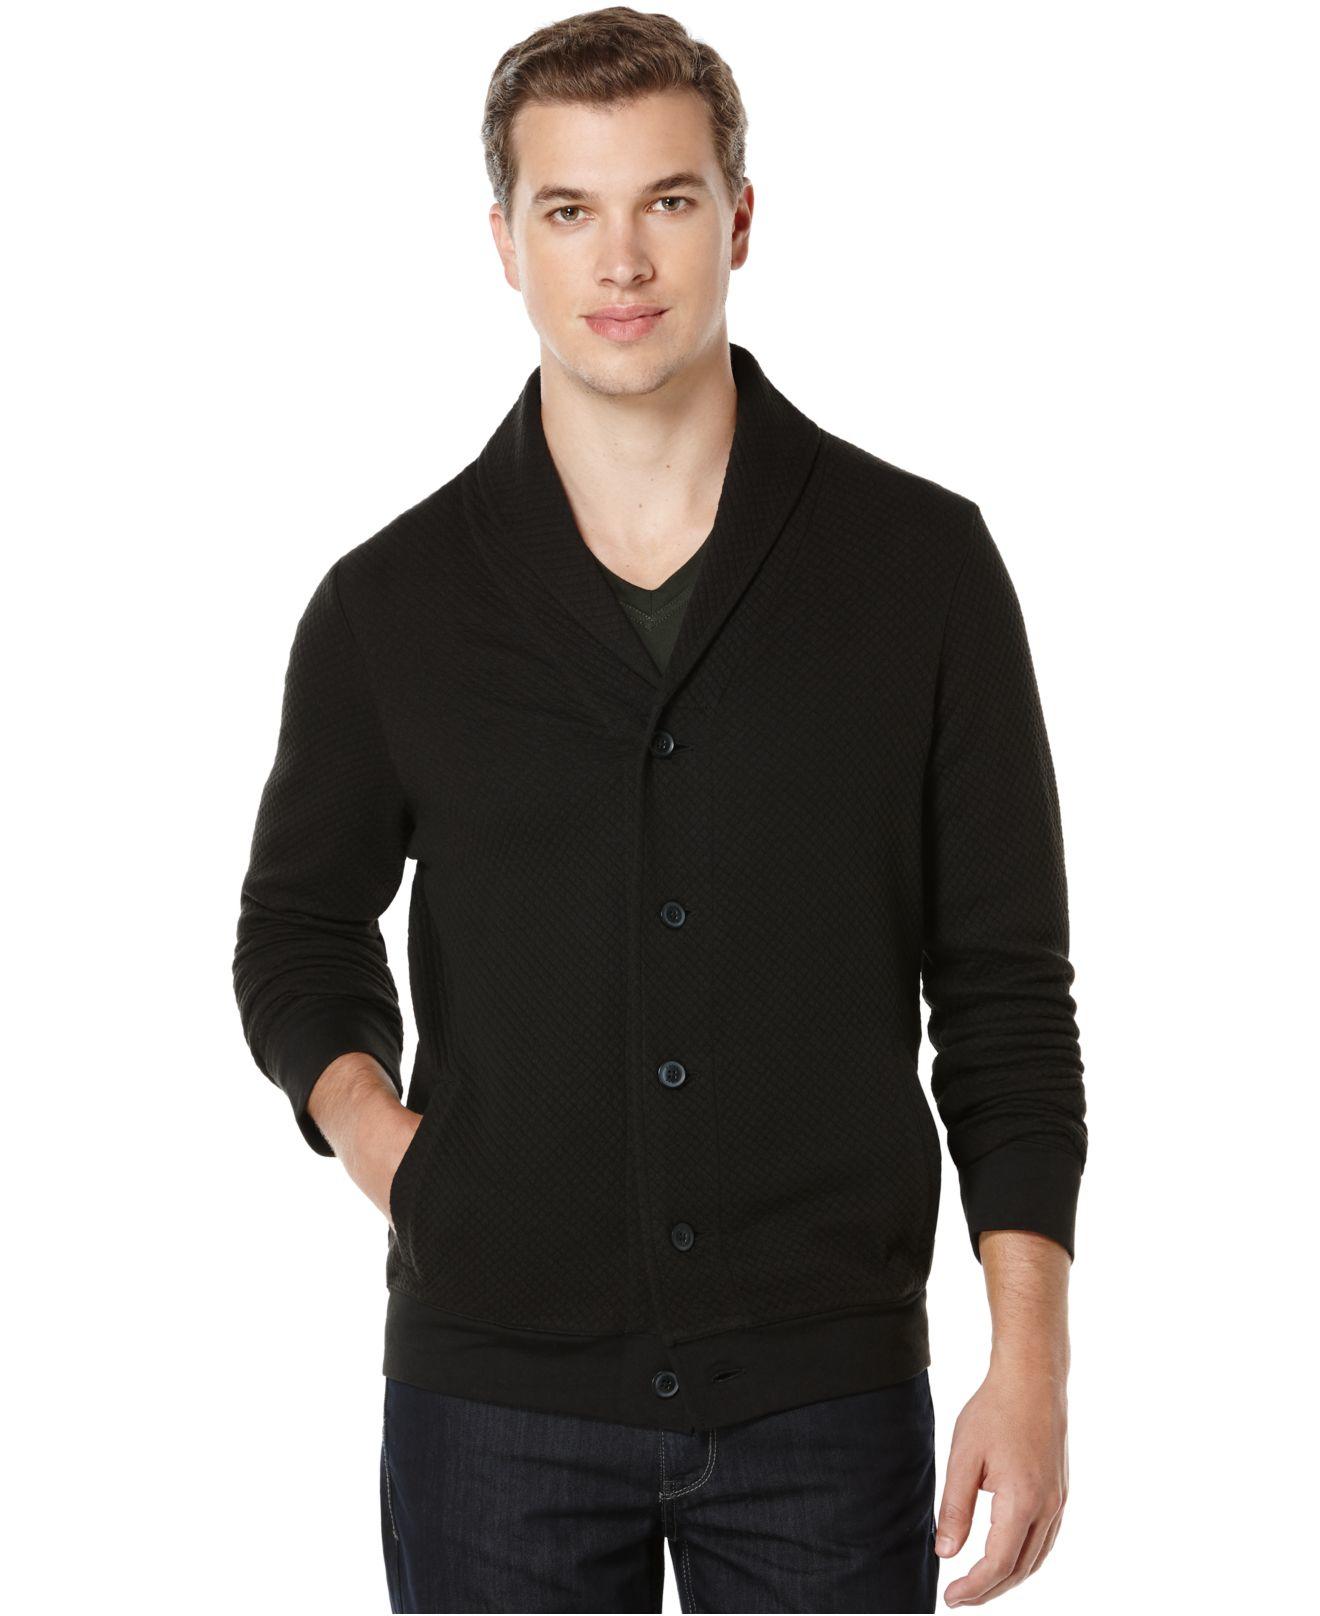 Perry ellis Big And Tall Shawl Collar Cardigan Sweater in Black ...